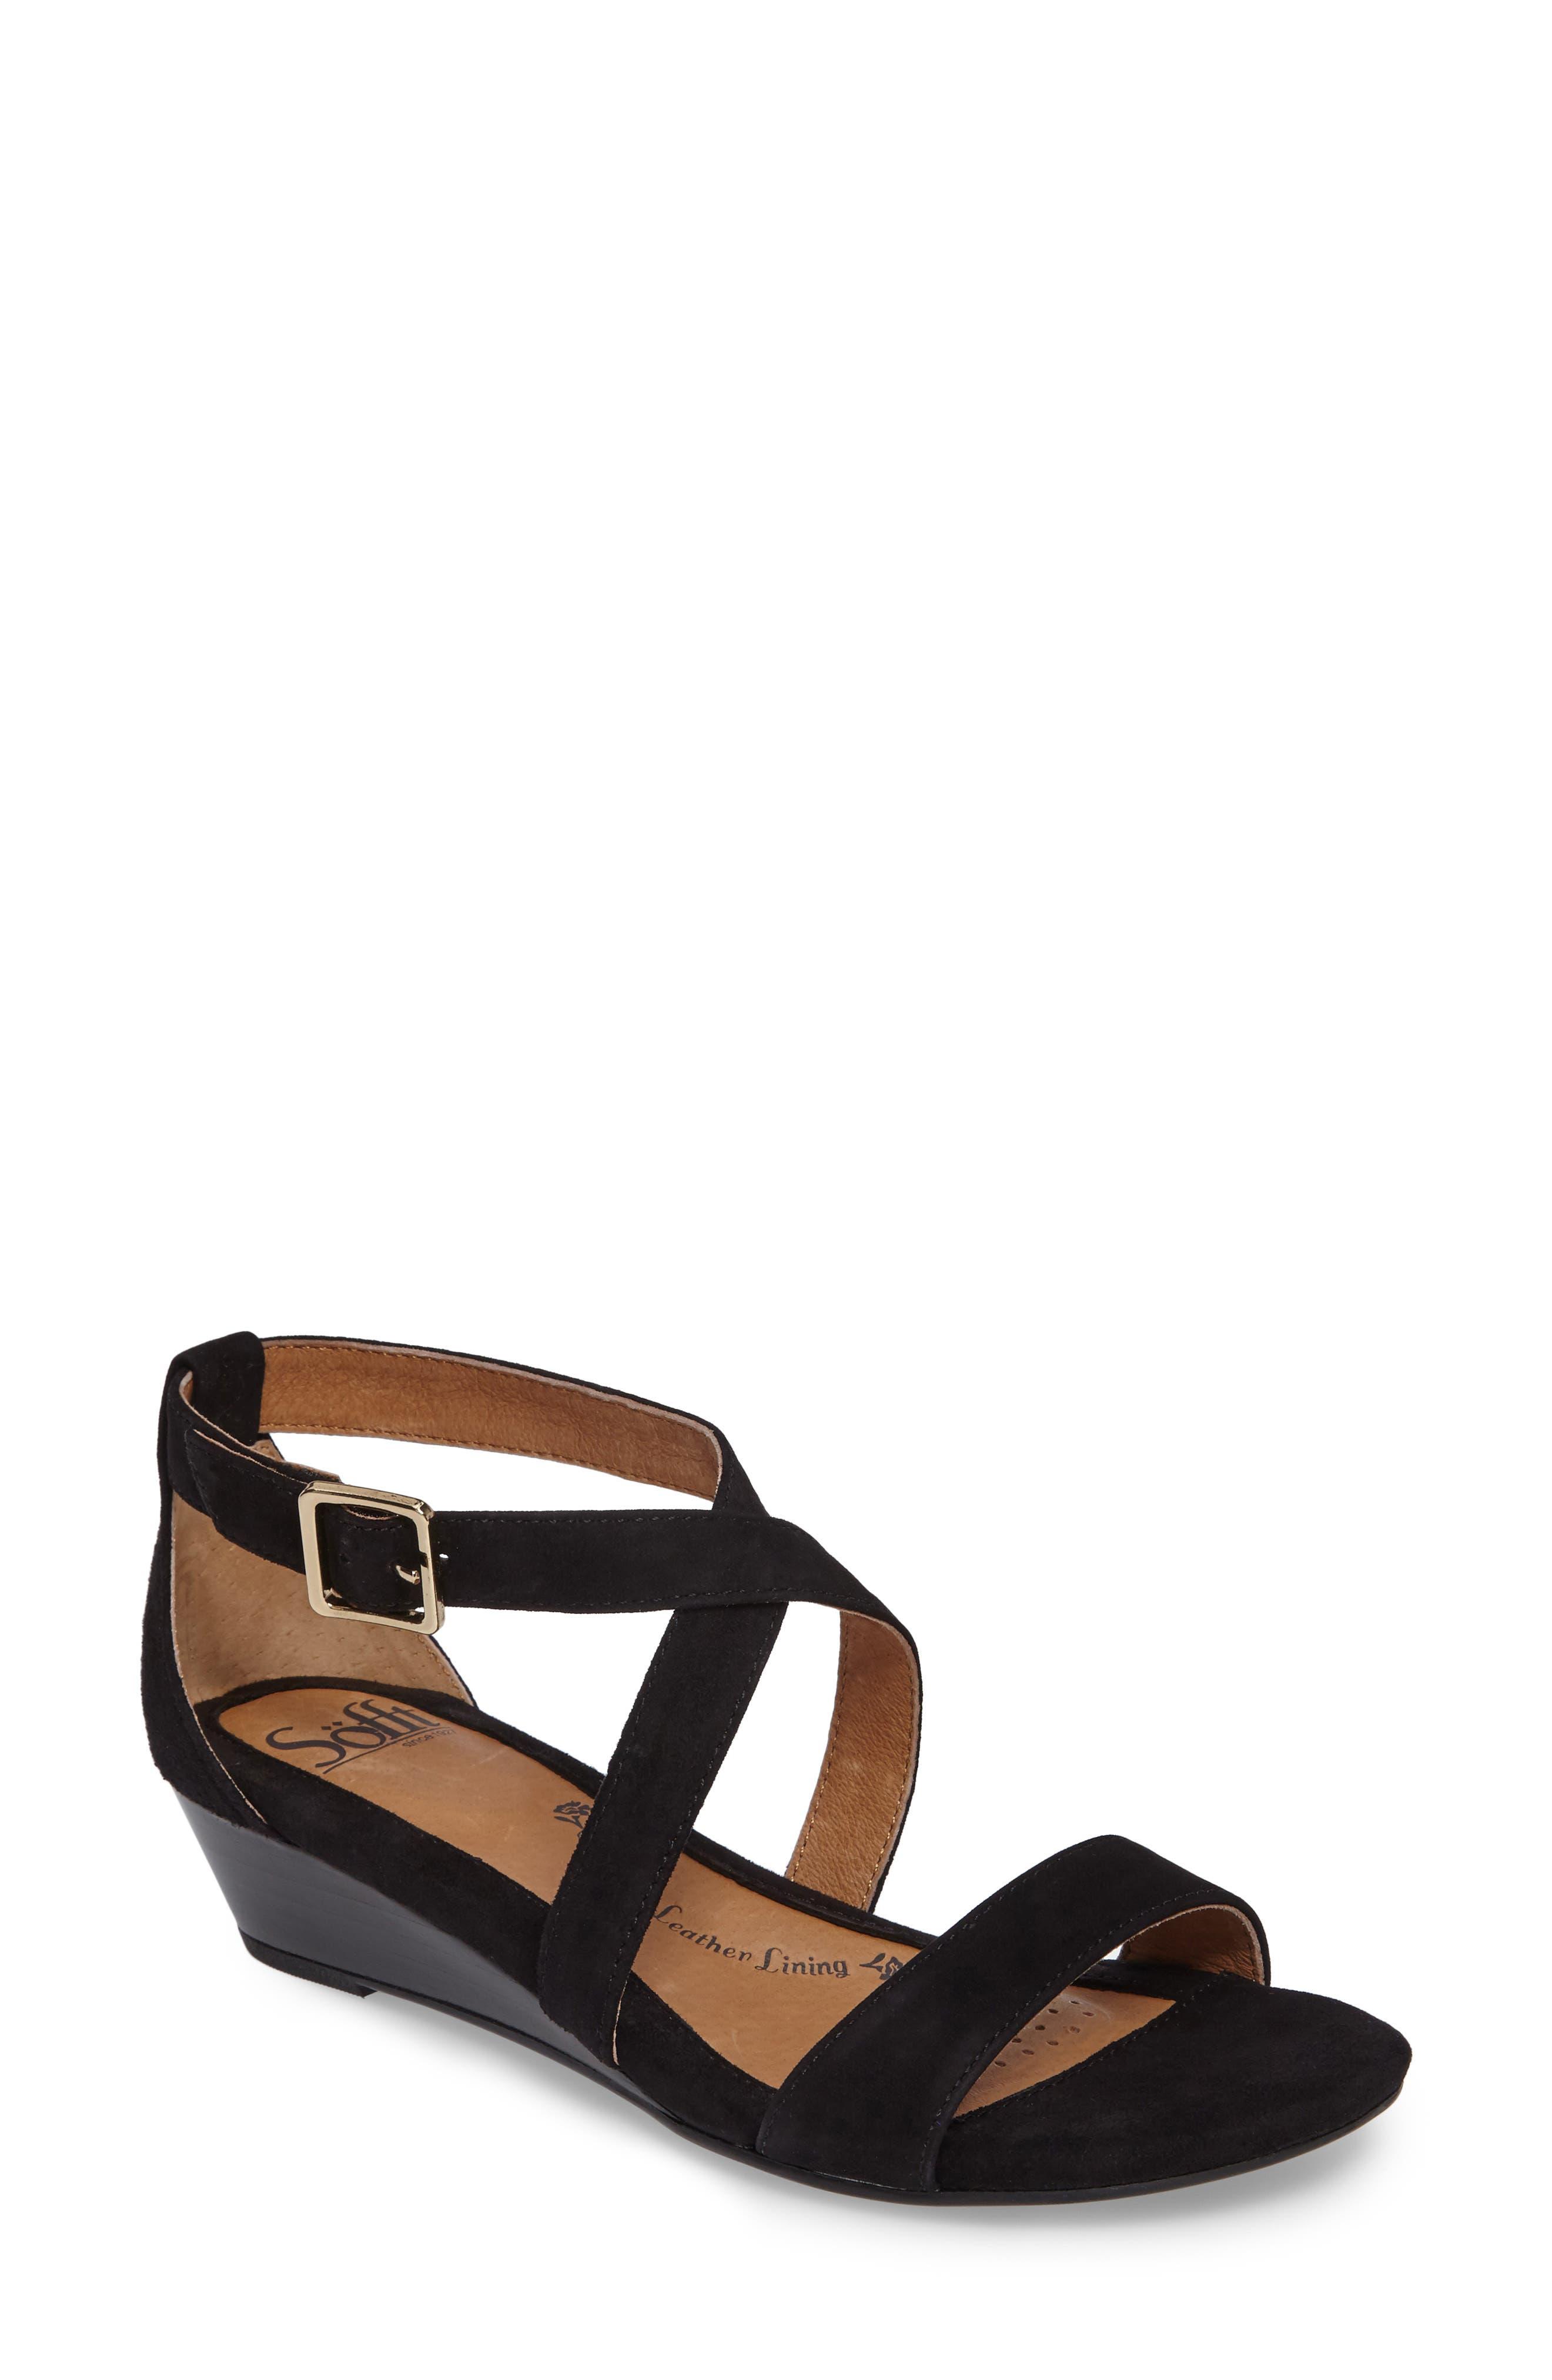 'Innis' Low Wedge Sandal,                             Main thumbnail 1, color,